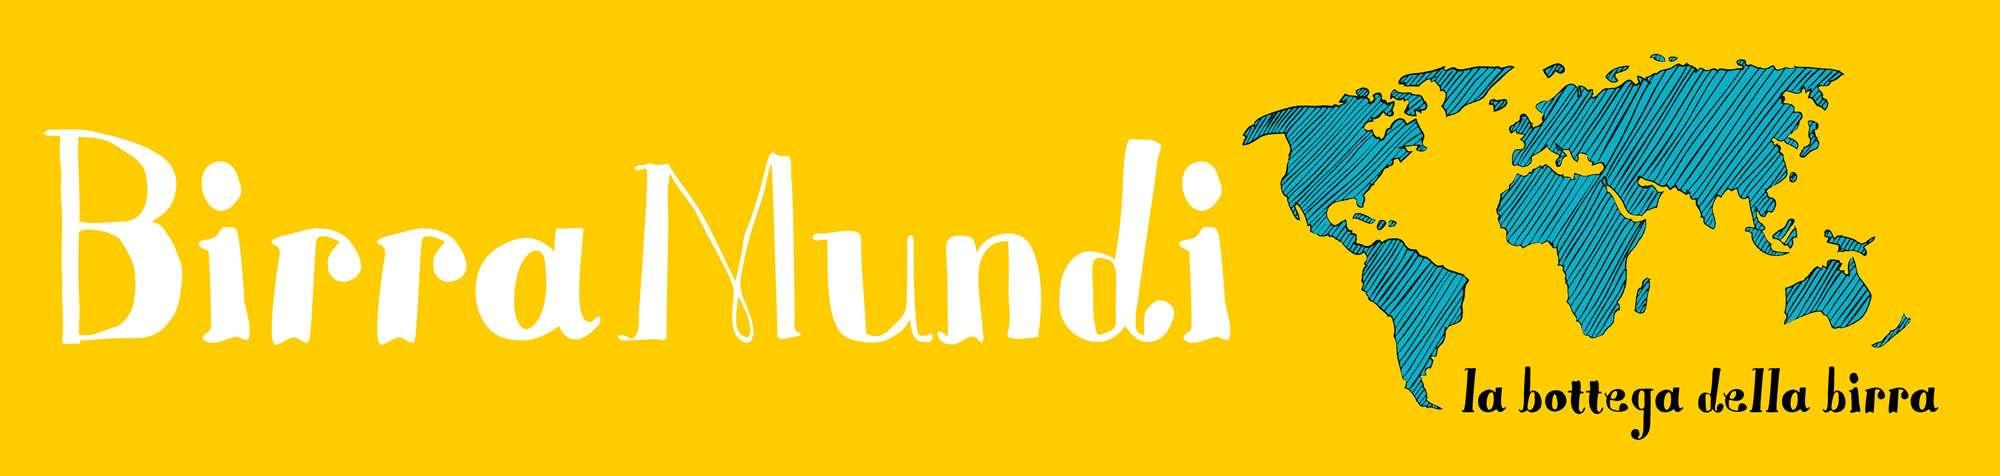 Birra Mundi